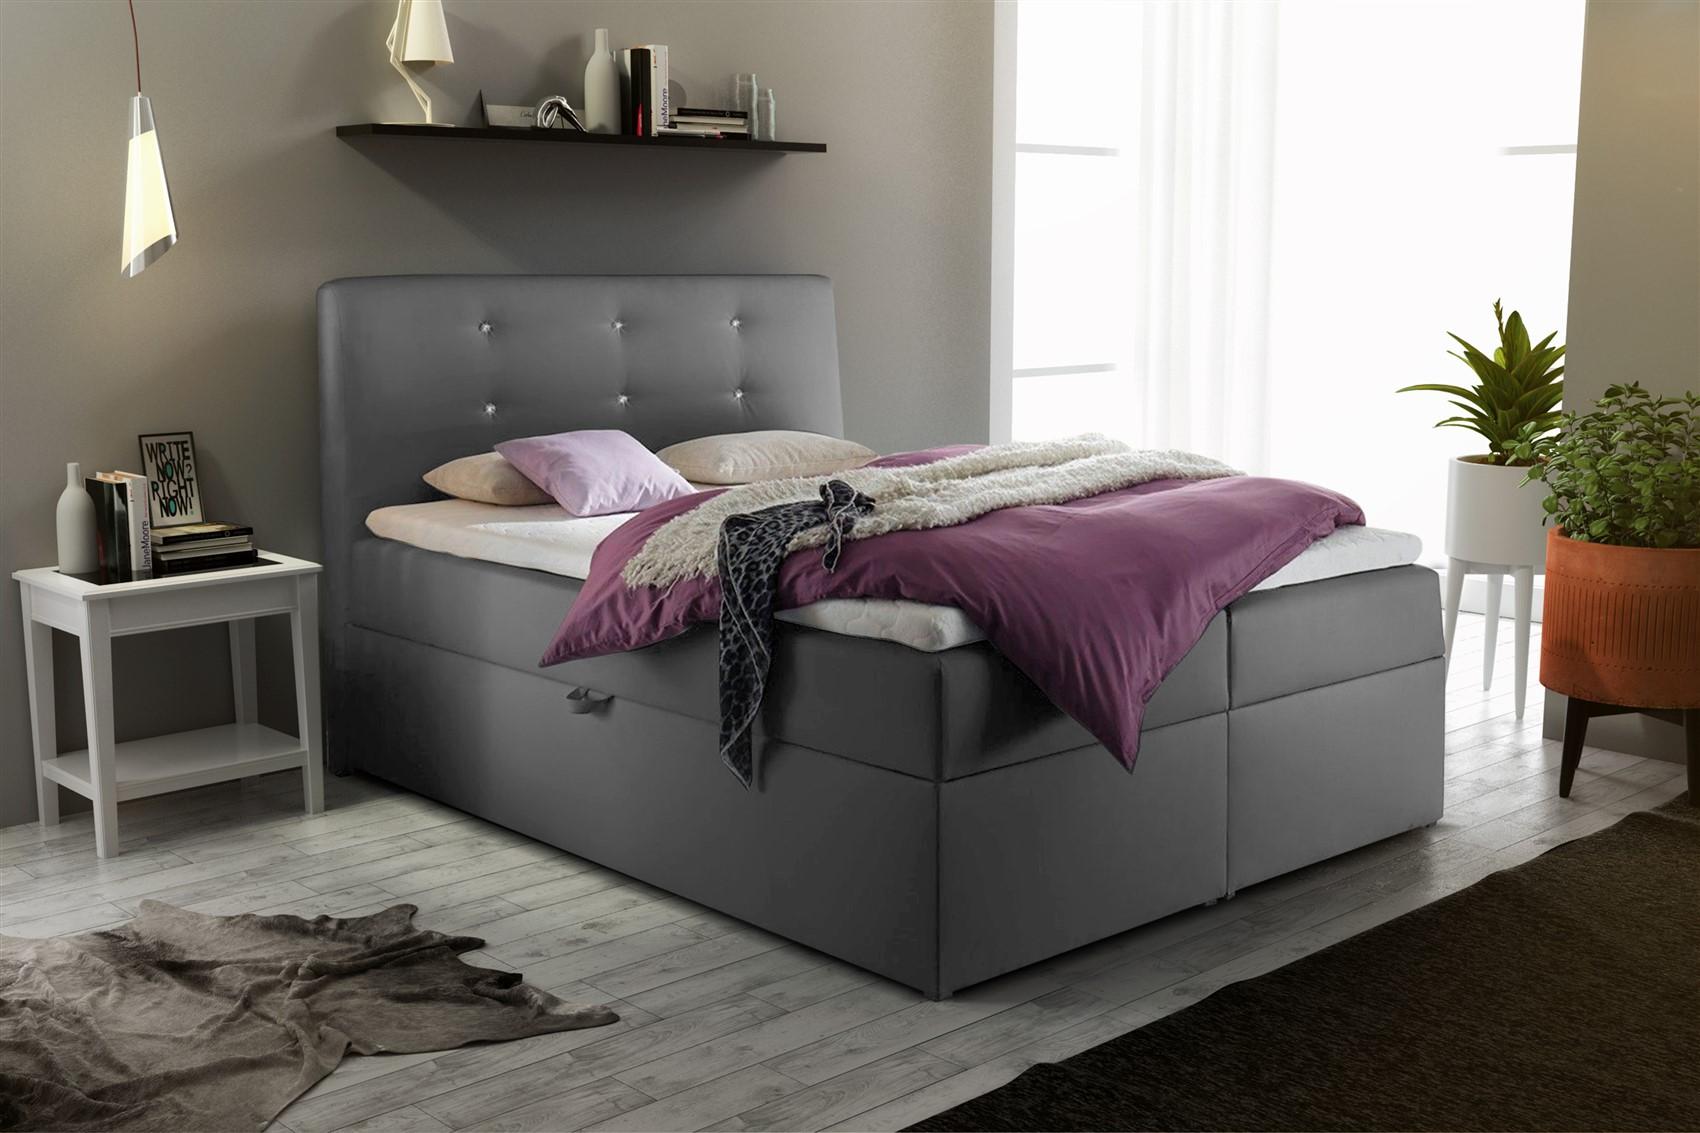 boxspringbett schlafzimmerbett monza kunstleder grau 120x200 cm fun m bel. Black Bedroom Furniture Sets. Home Design Ideas